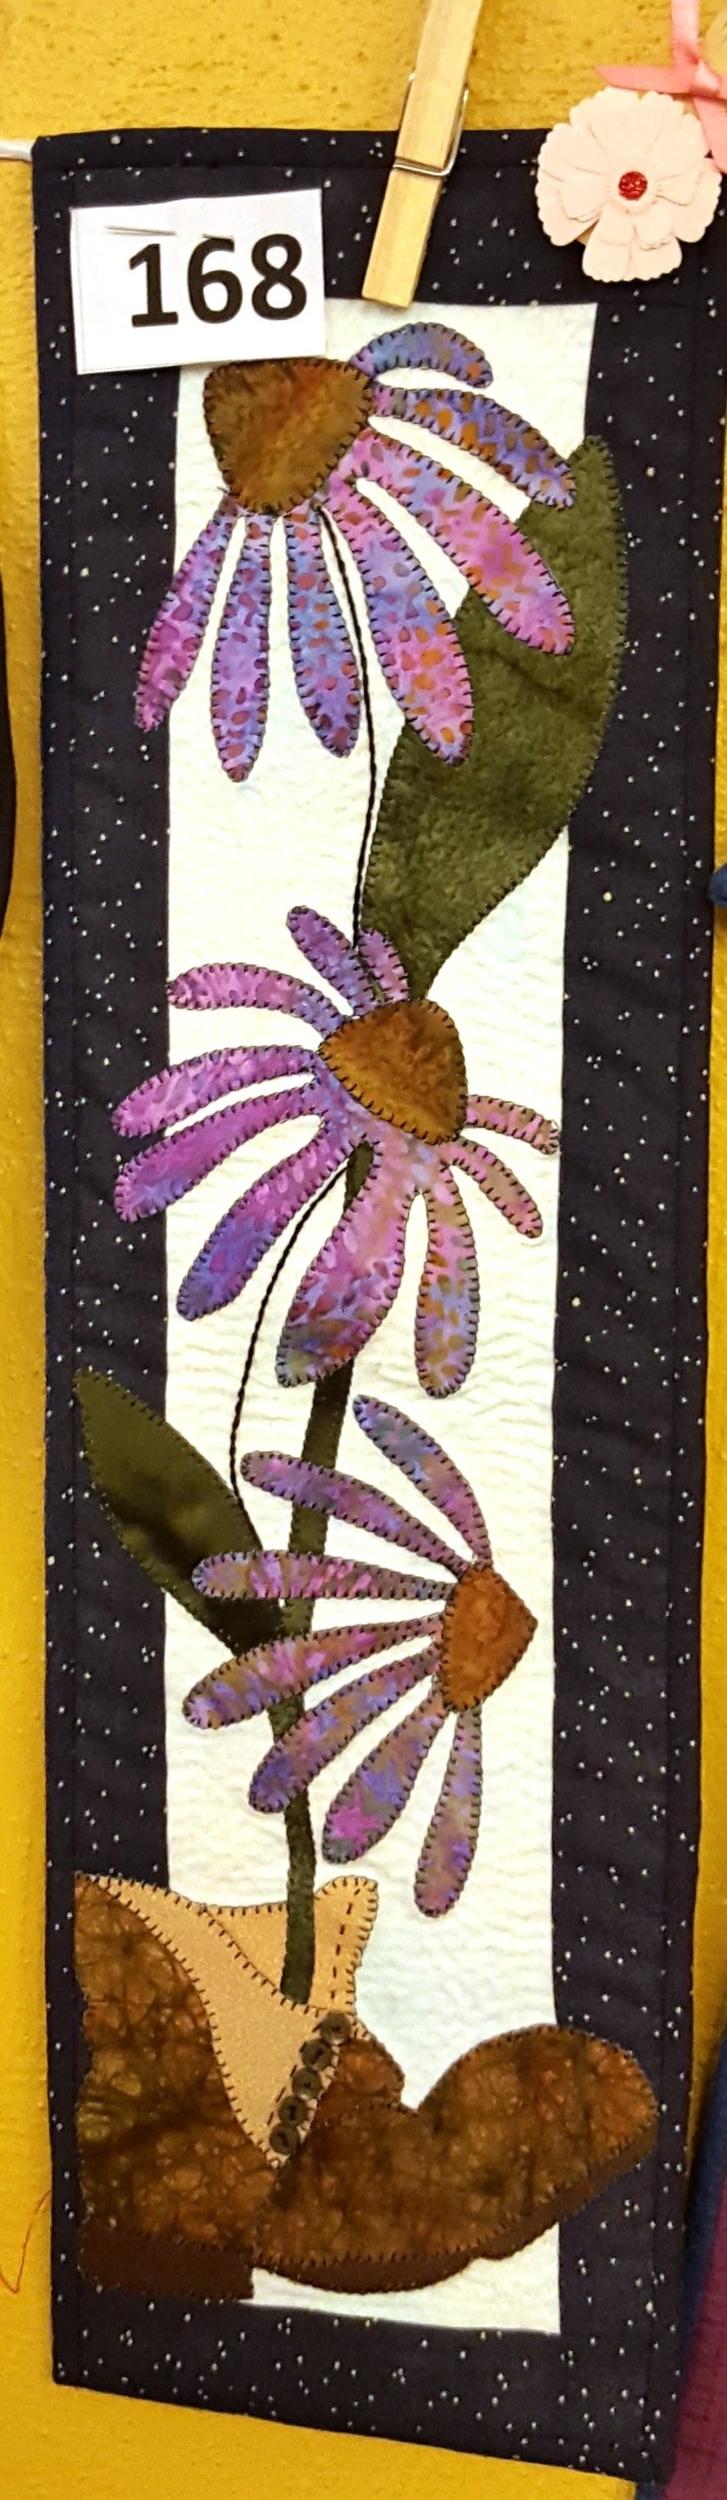 small quilt winner 6.jpg